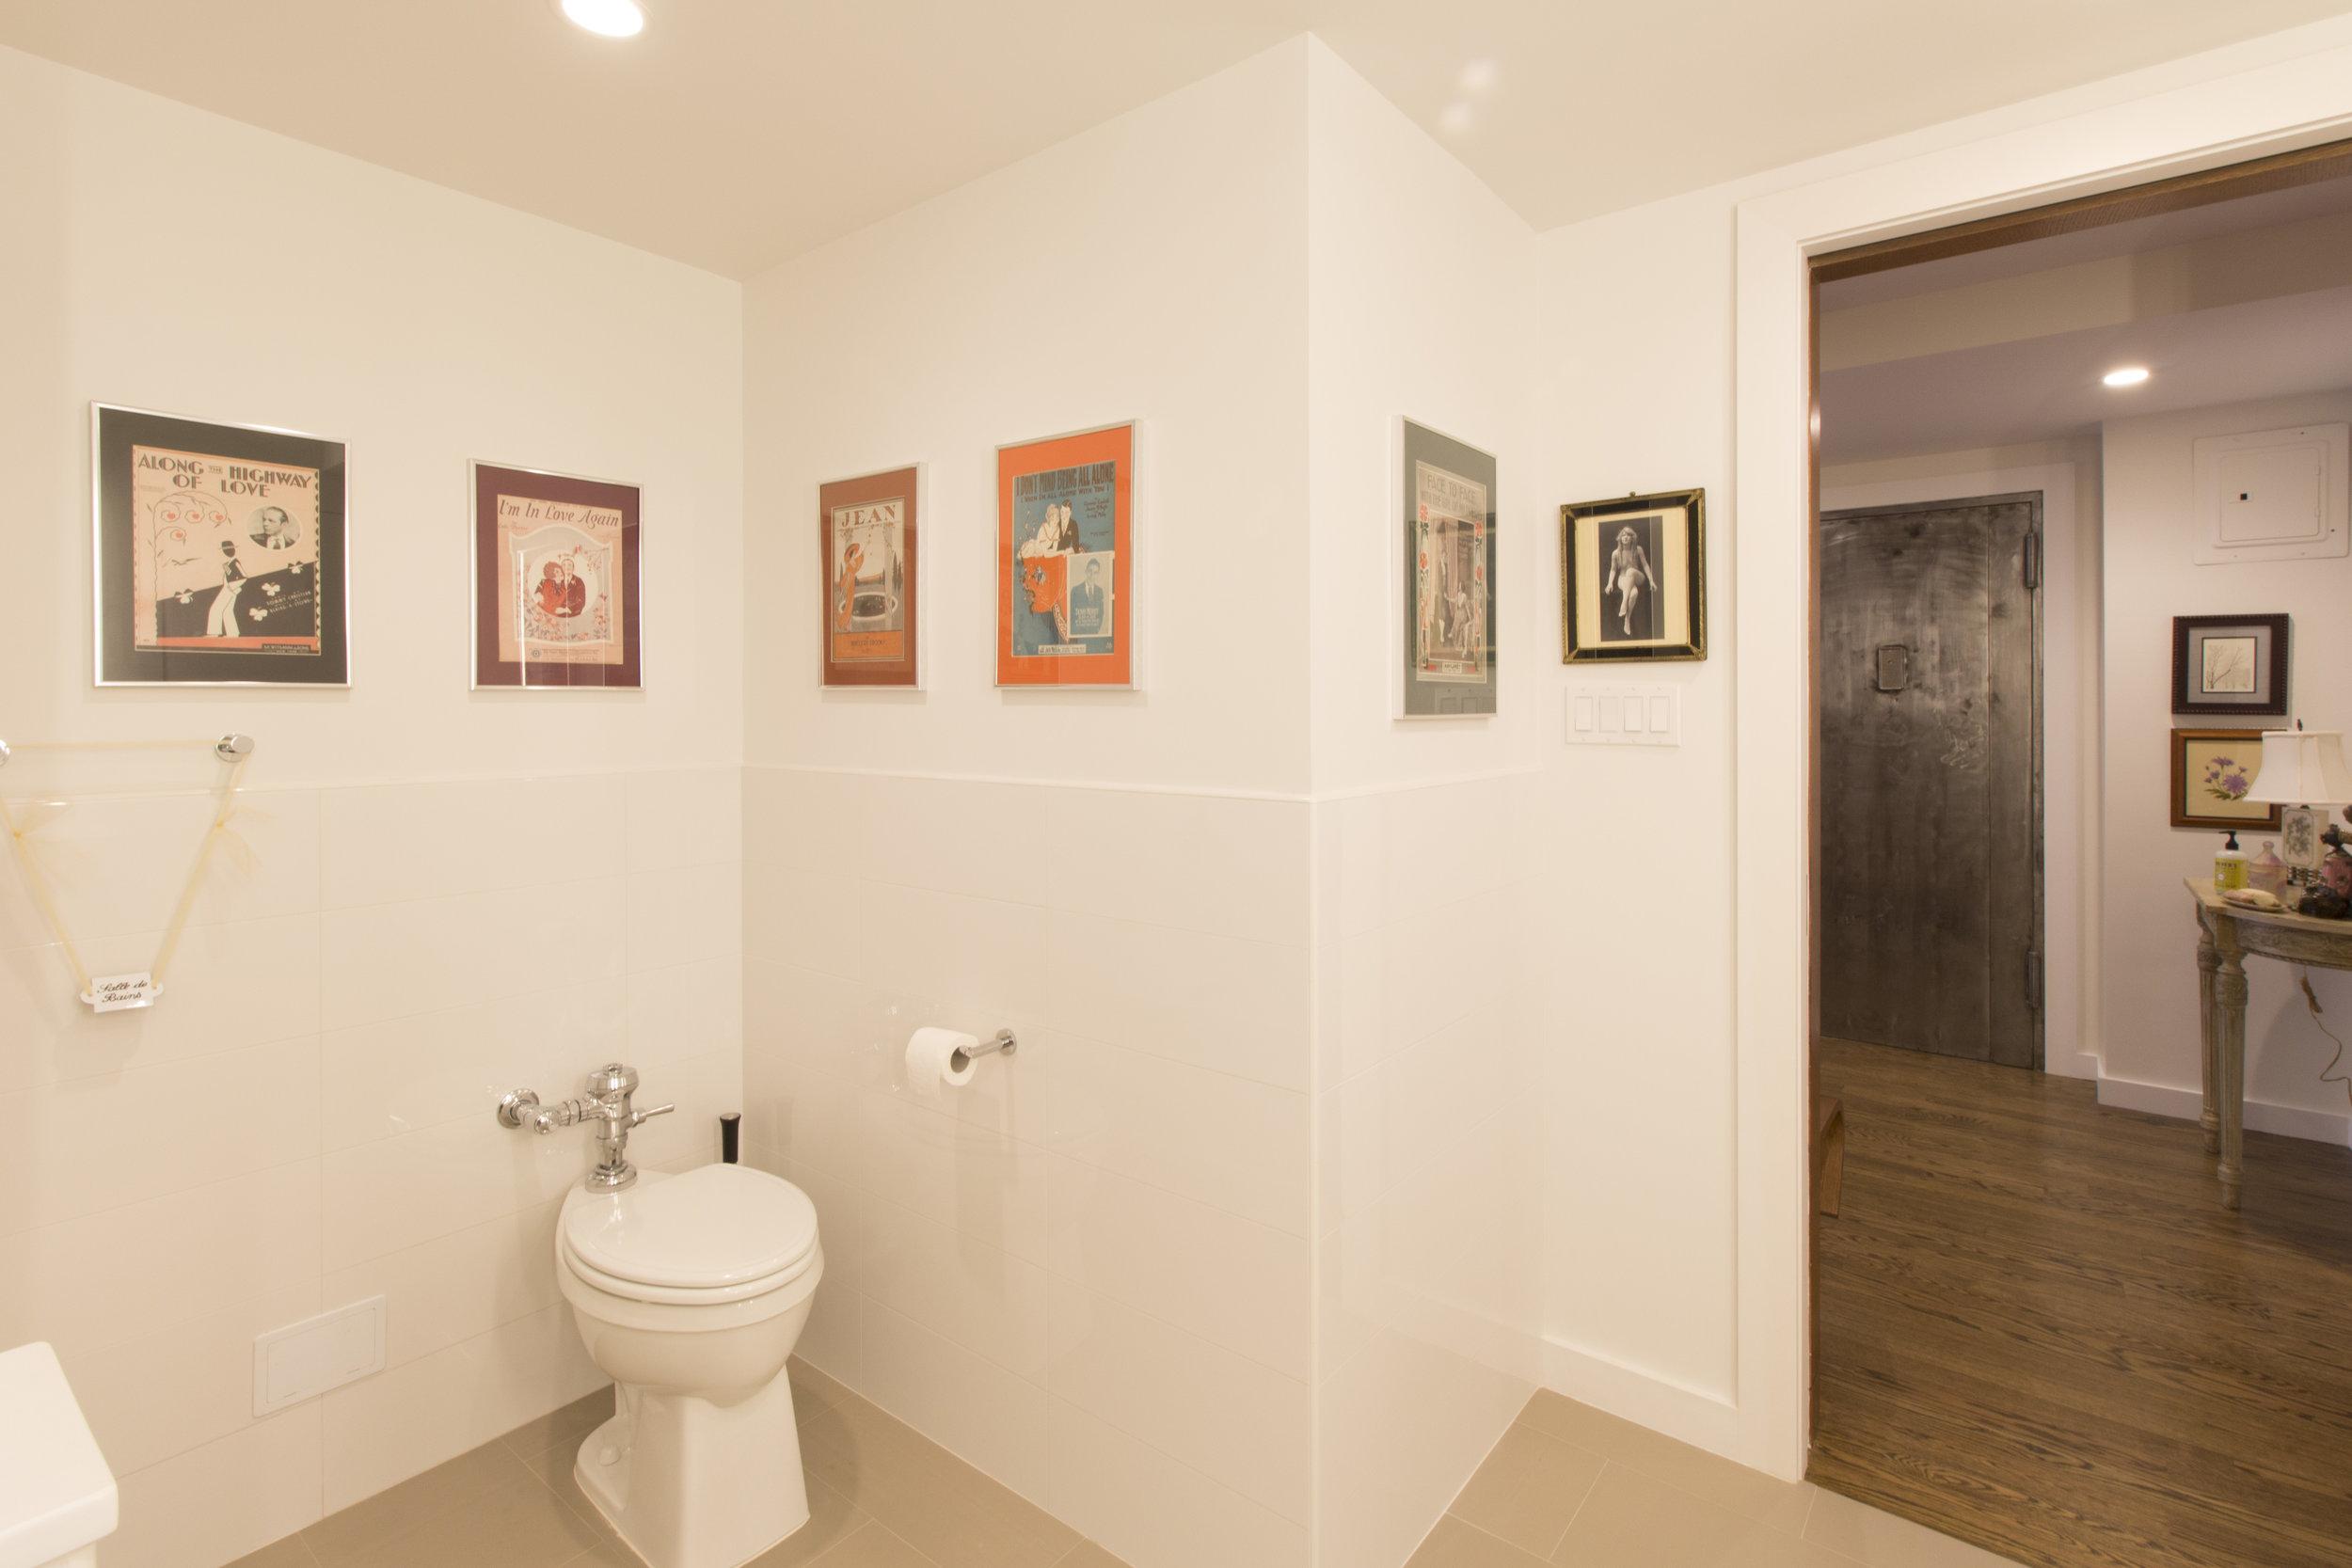 Dameron_37st_bathroom.jpg